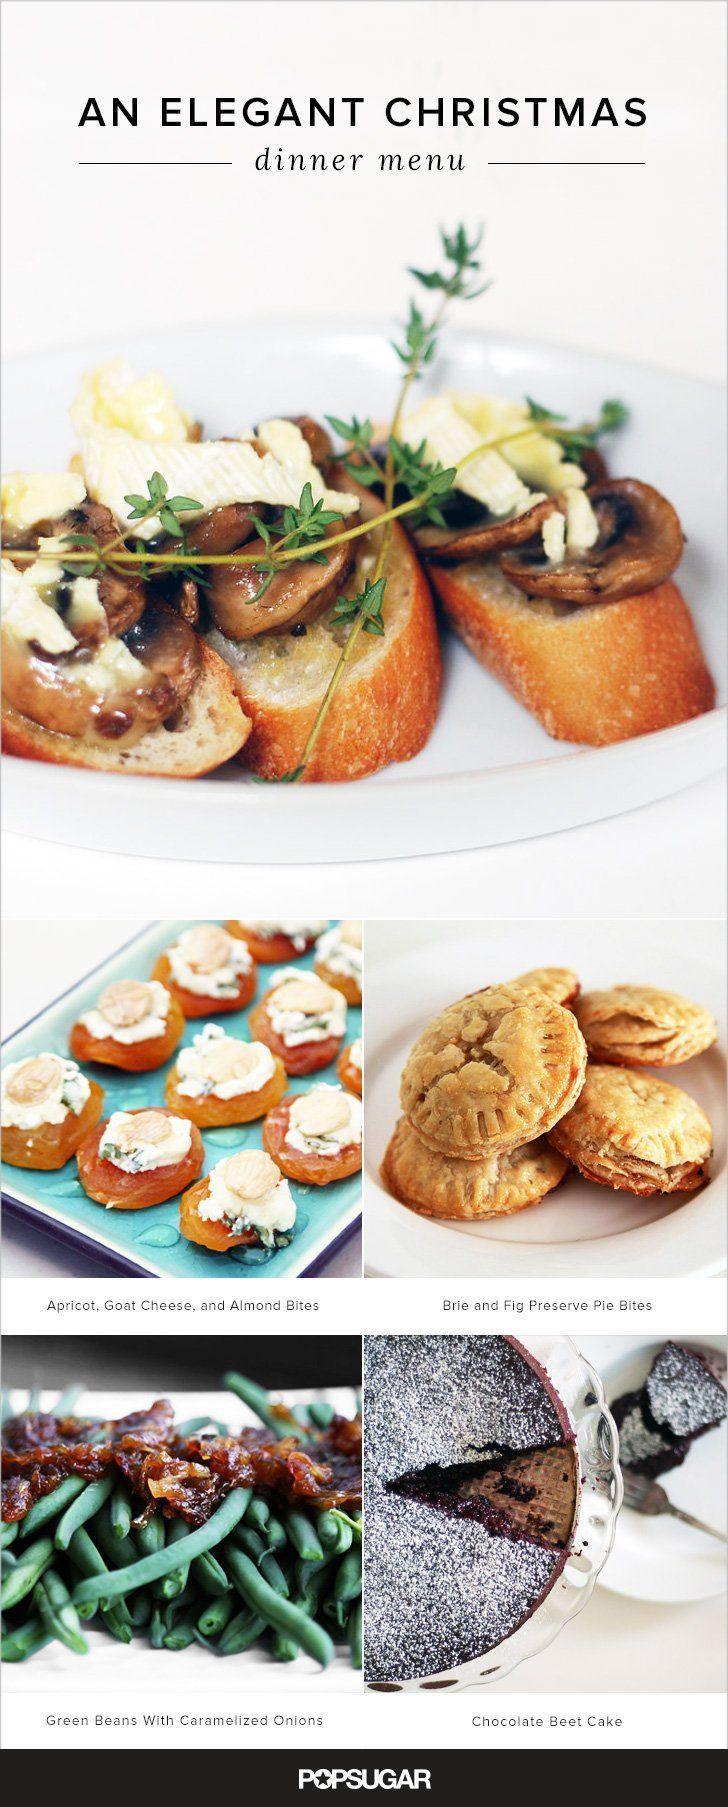 Menus For Christmas Dinners  17 Best ideas about Christmas Dinner Menu on Pinterest